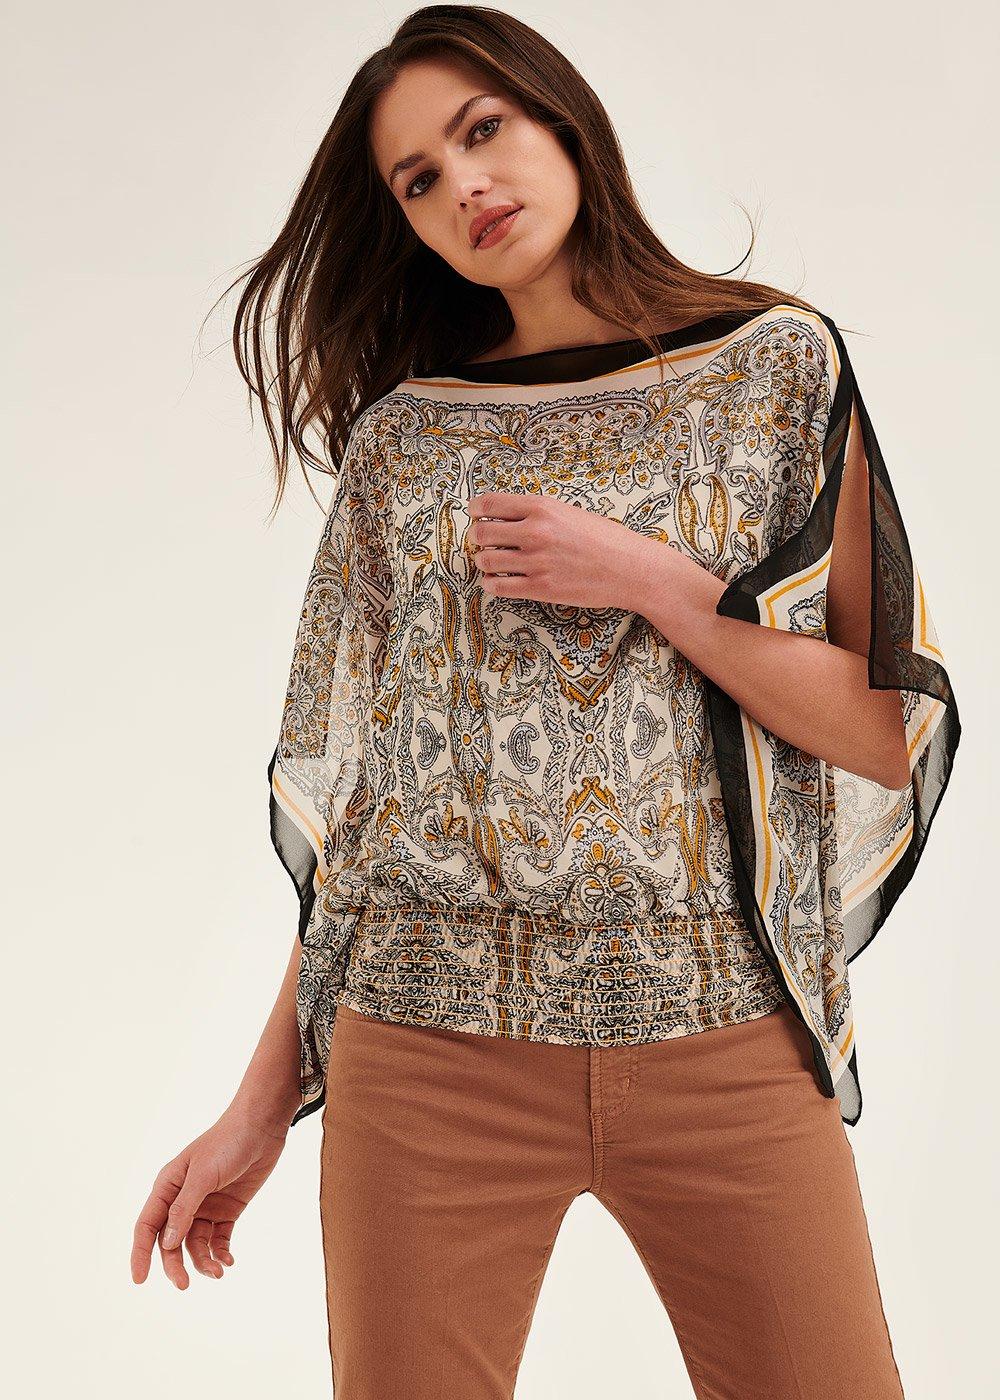 Stephany handkerchief t-shirt - L.beige / Sole / Fantasia - Woman